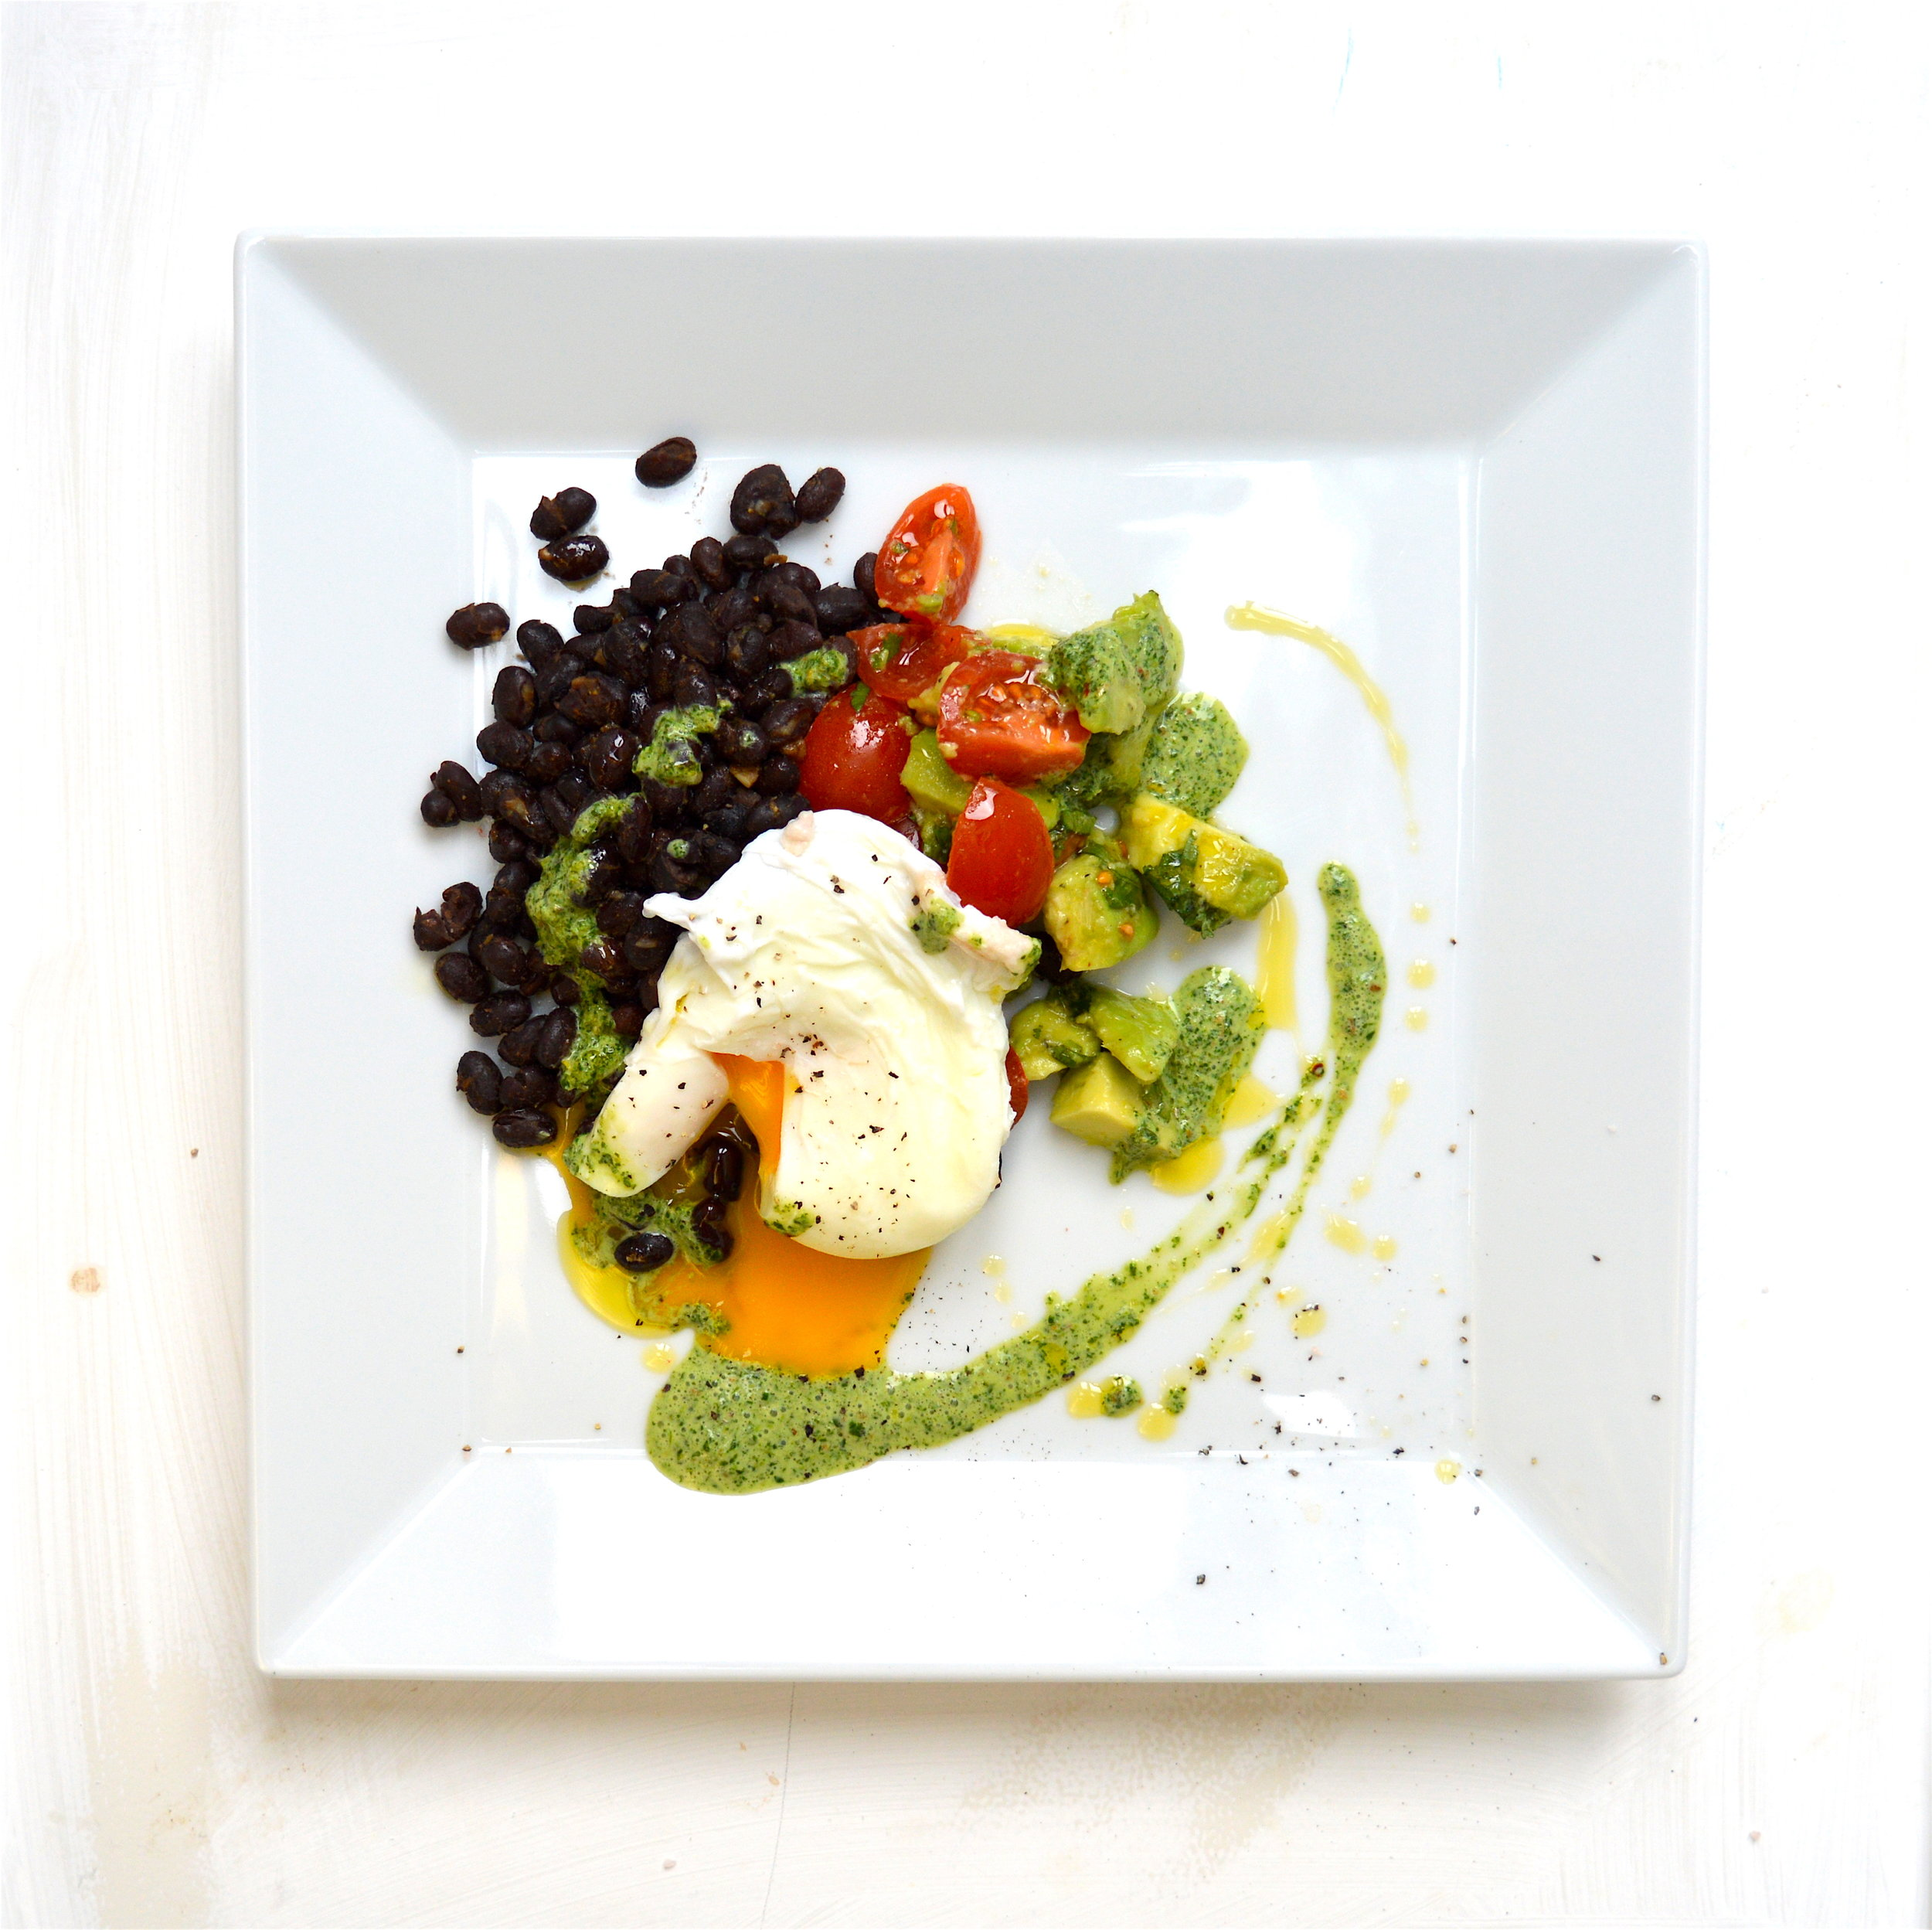 mexican-breakfast-with-coriander-mint-chilli-salsa.jpg